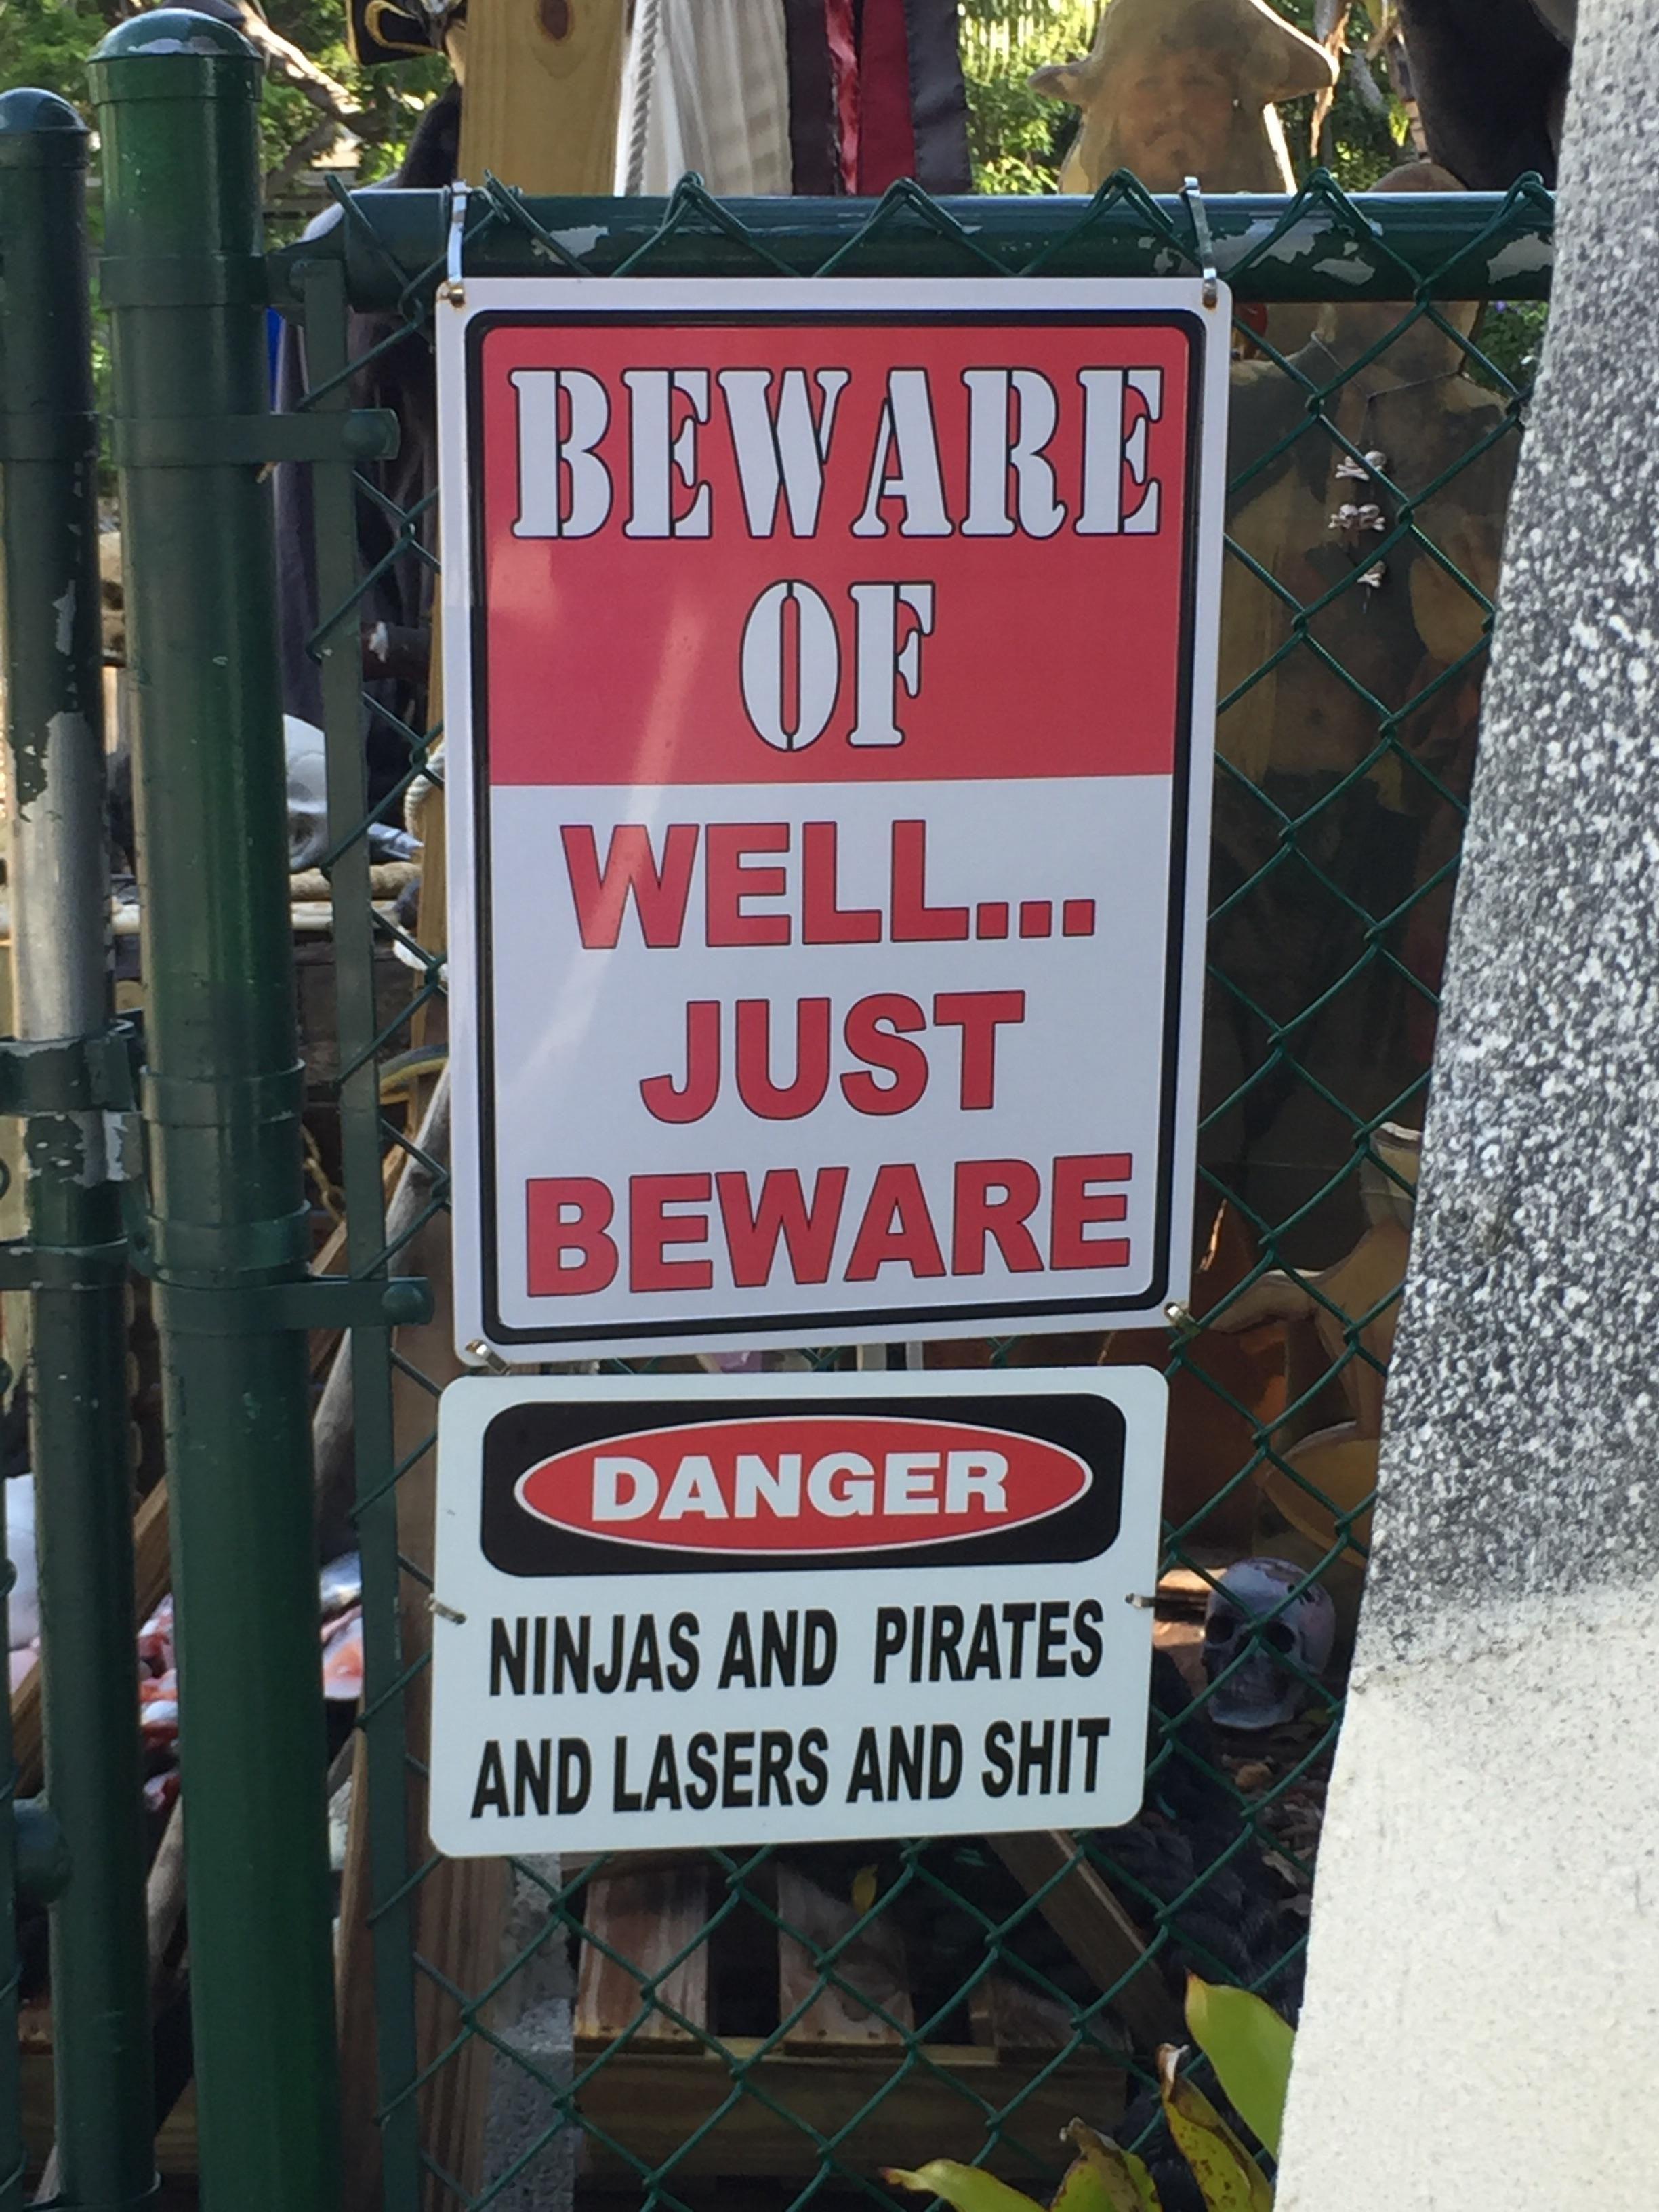 Beware of well... just beware